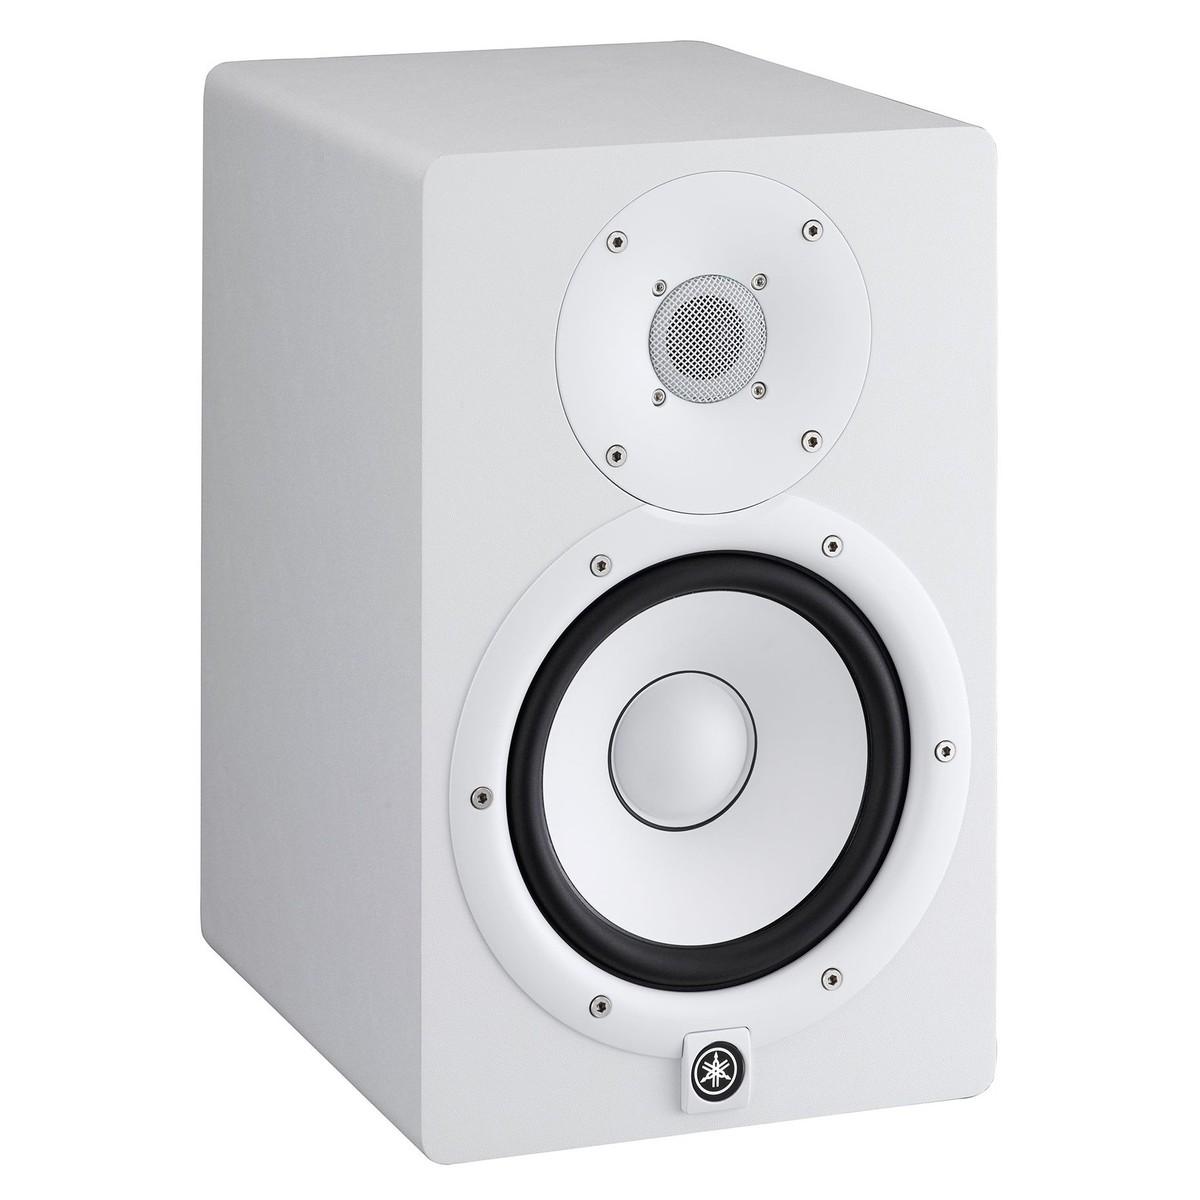 yamaha hs7w full range studio monitor white b stock at gear4music. Black Bedroom Furniture Sets. Home Design Ideas